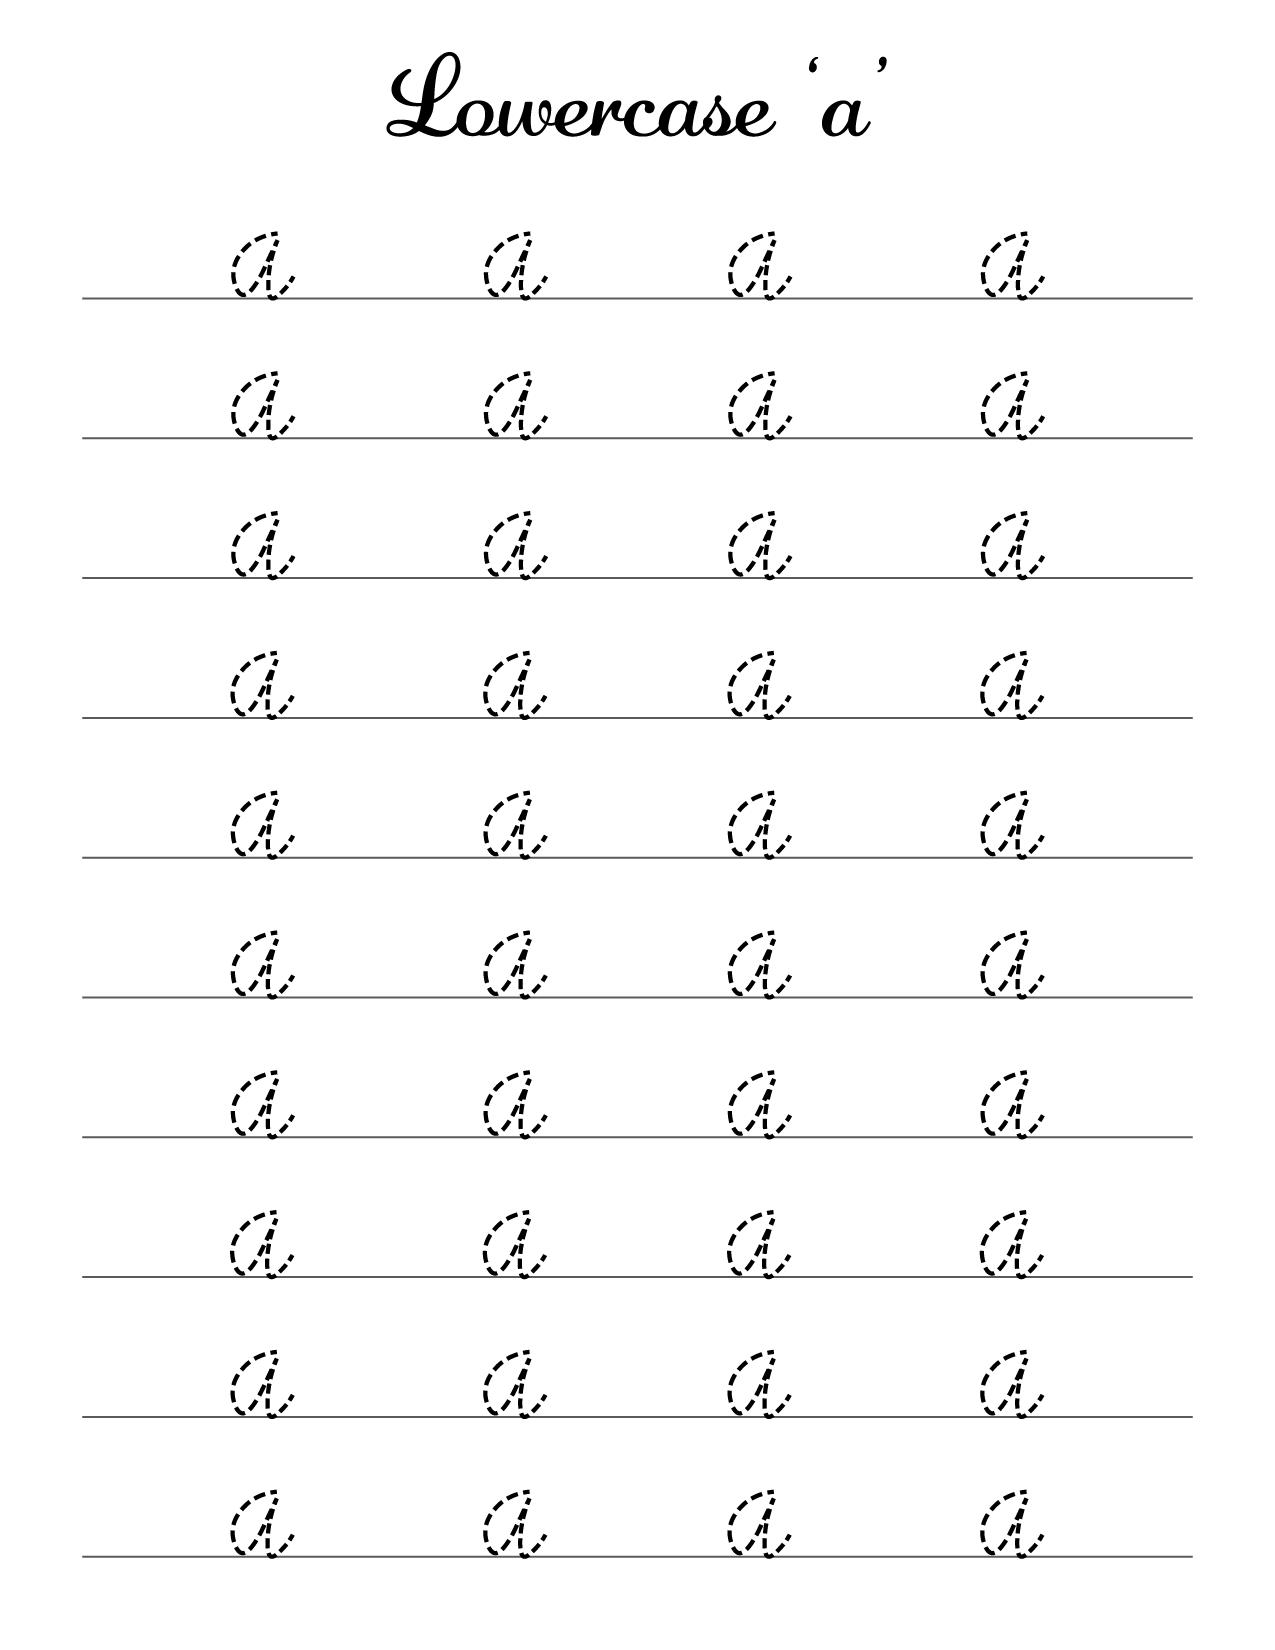 lowercase a cursive practice